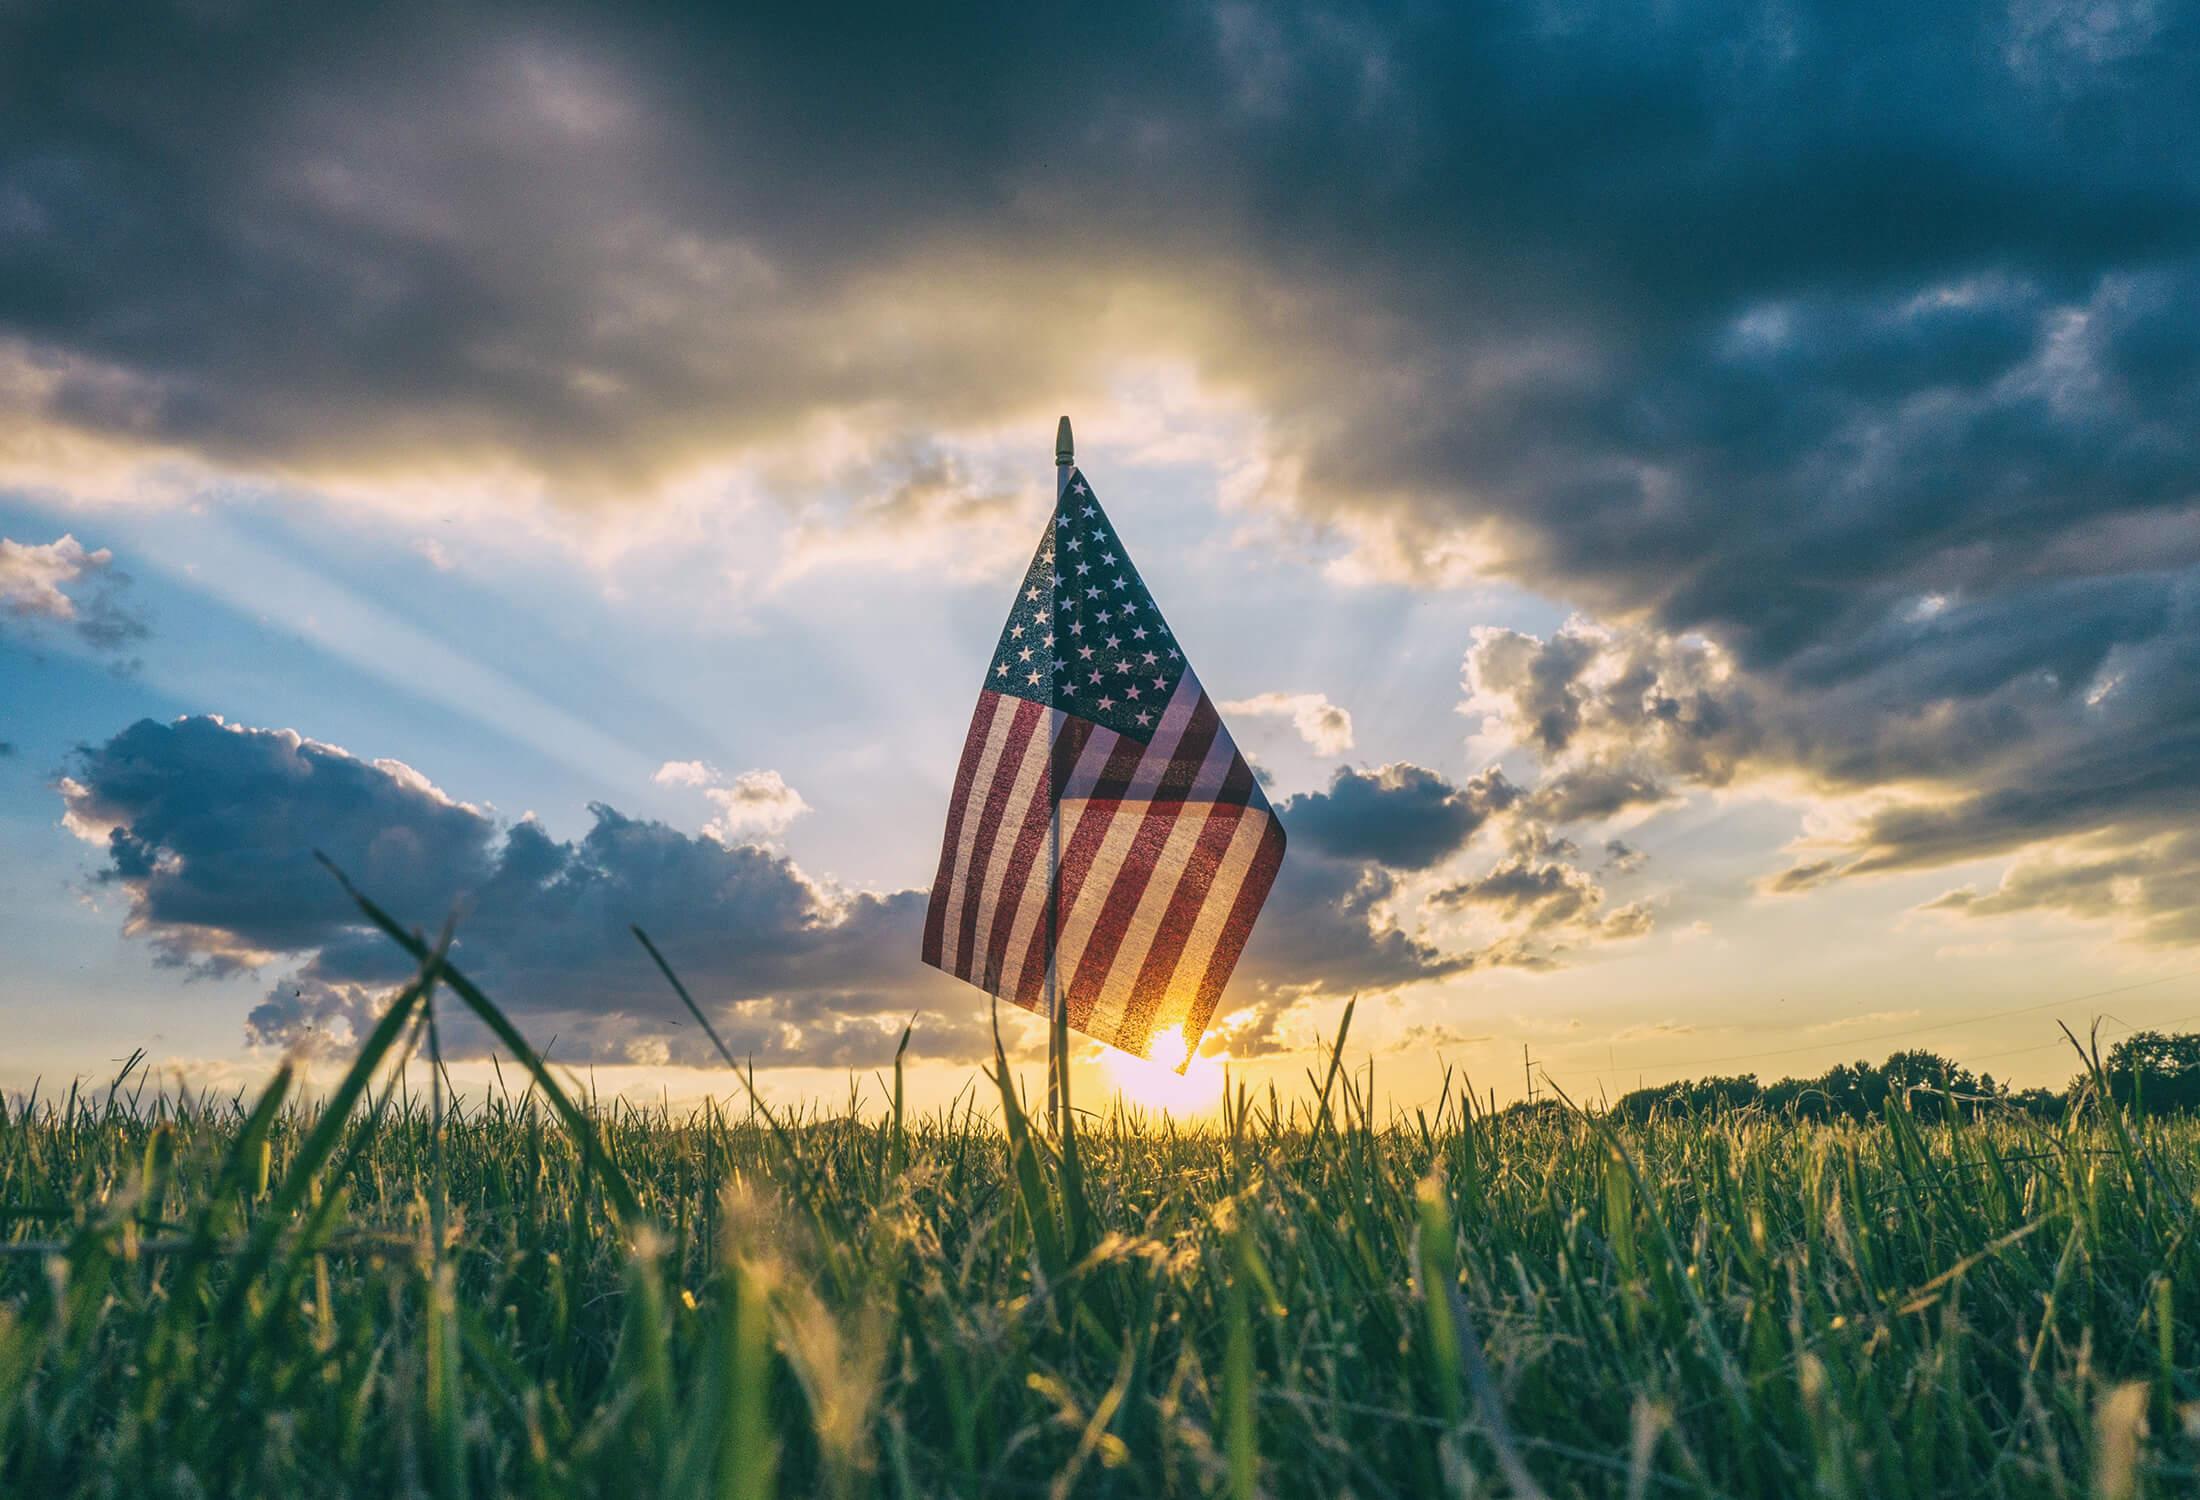 an american flag in a field